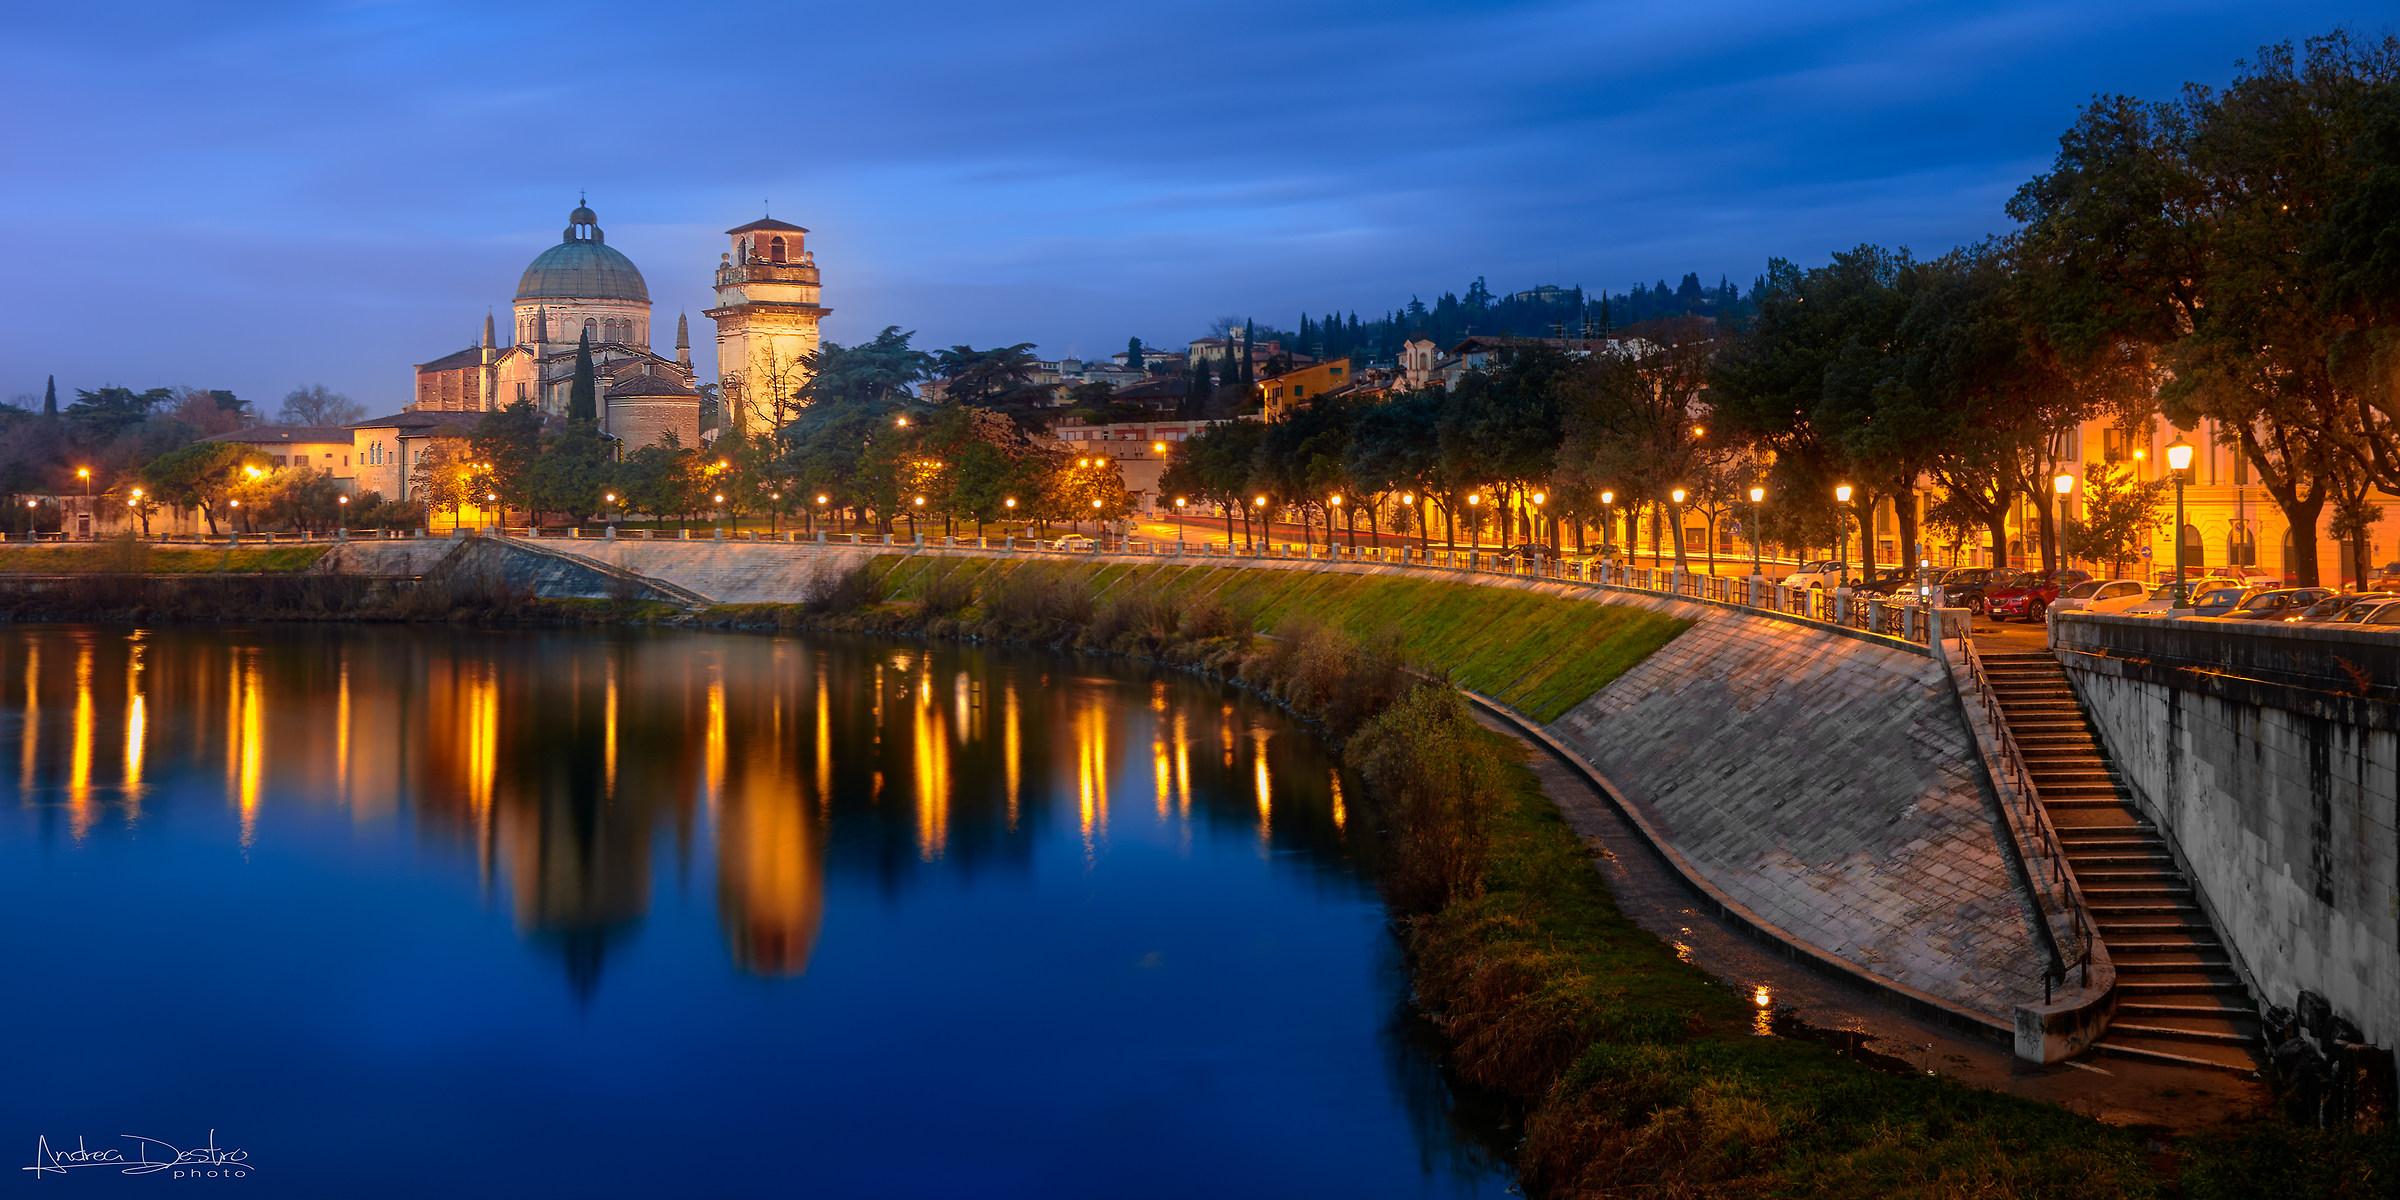 San Giorgio in Braida - Verona...